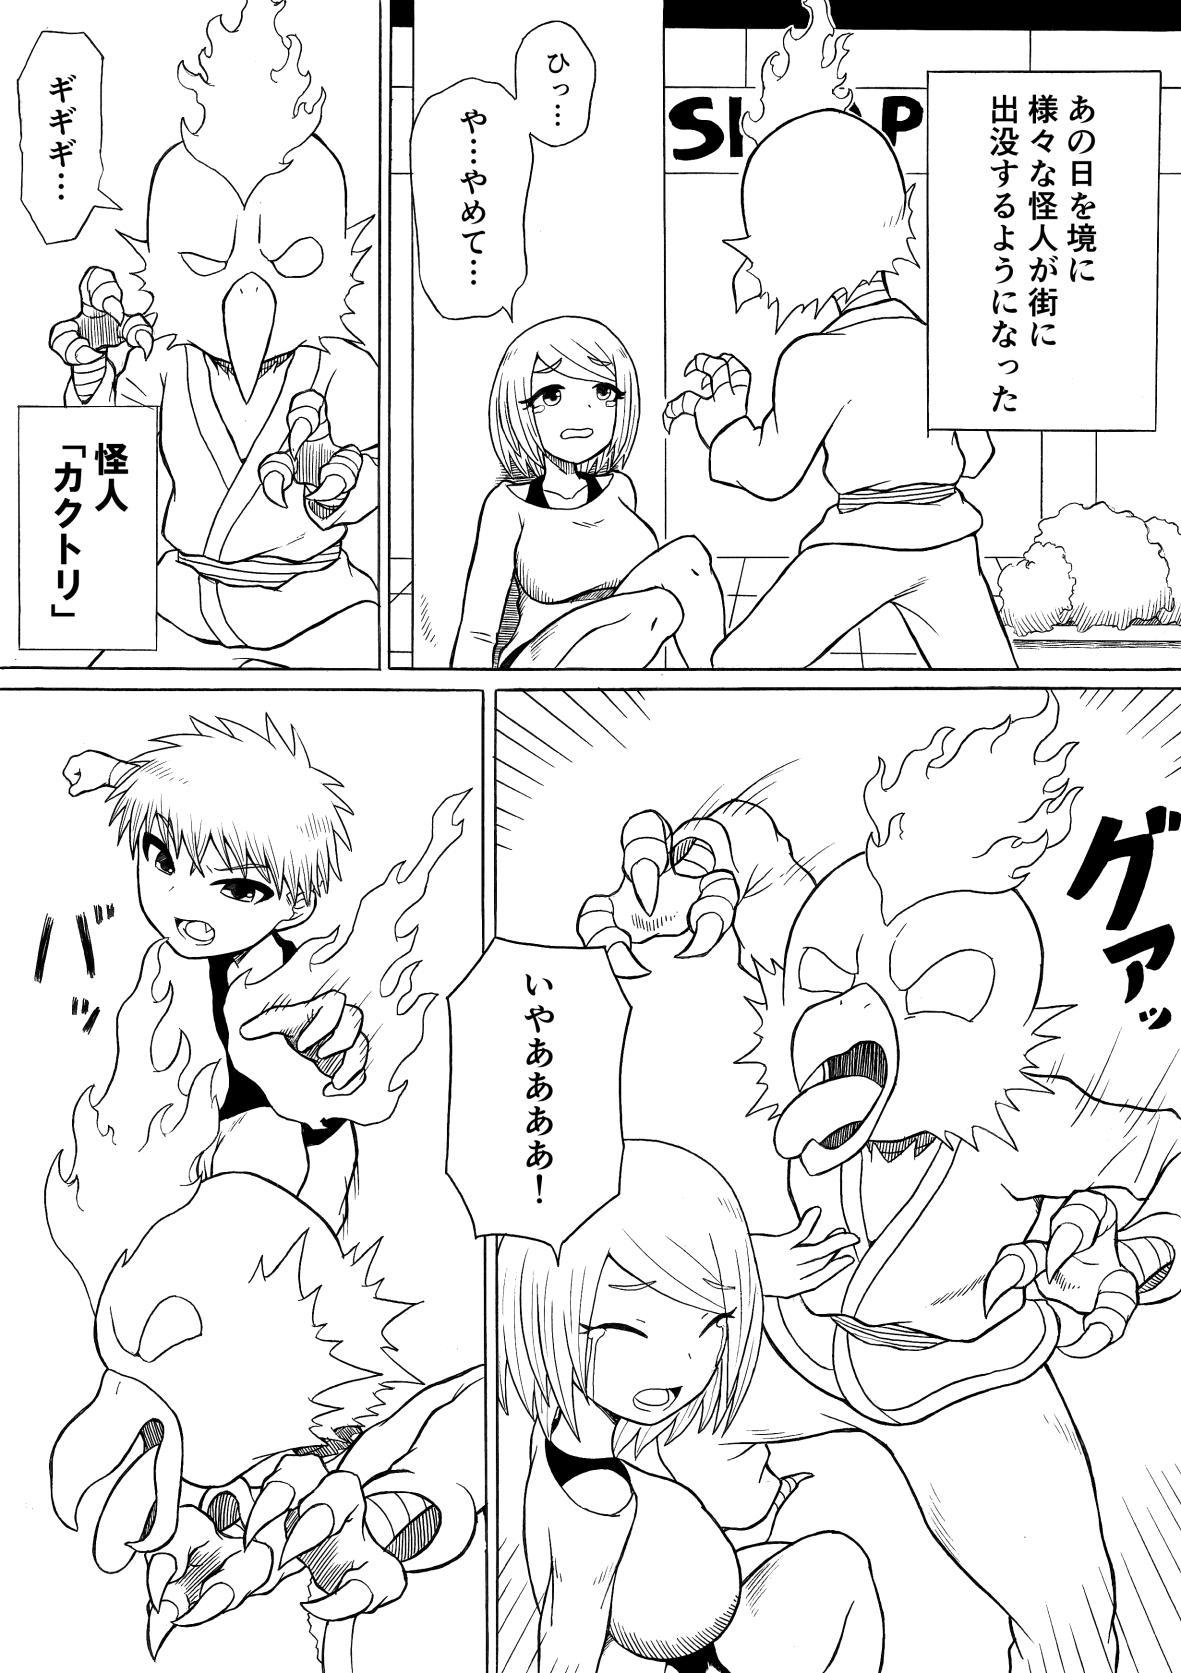 Hero haiboku 3